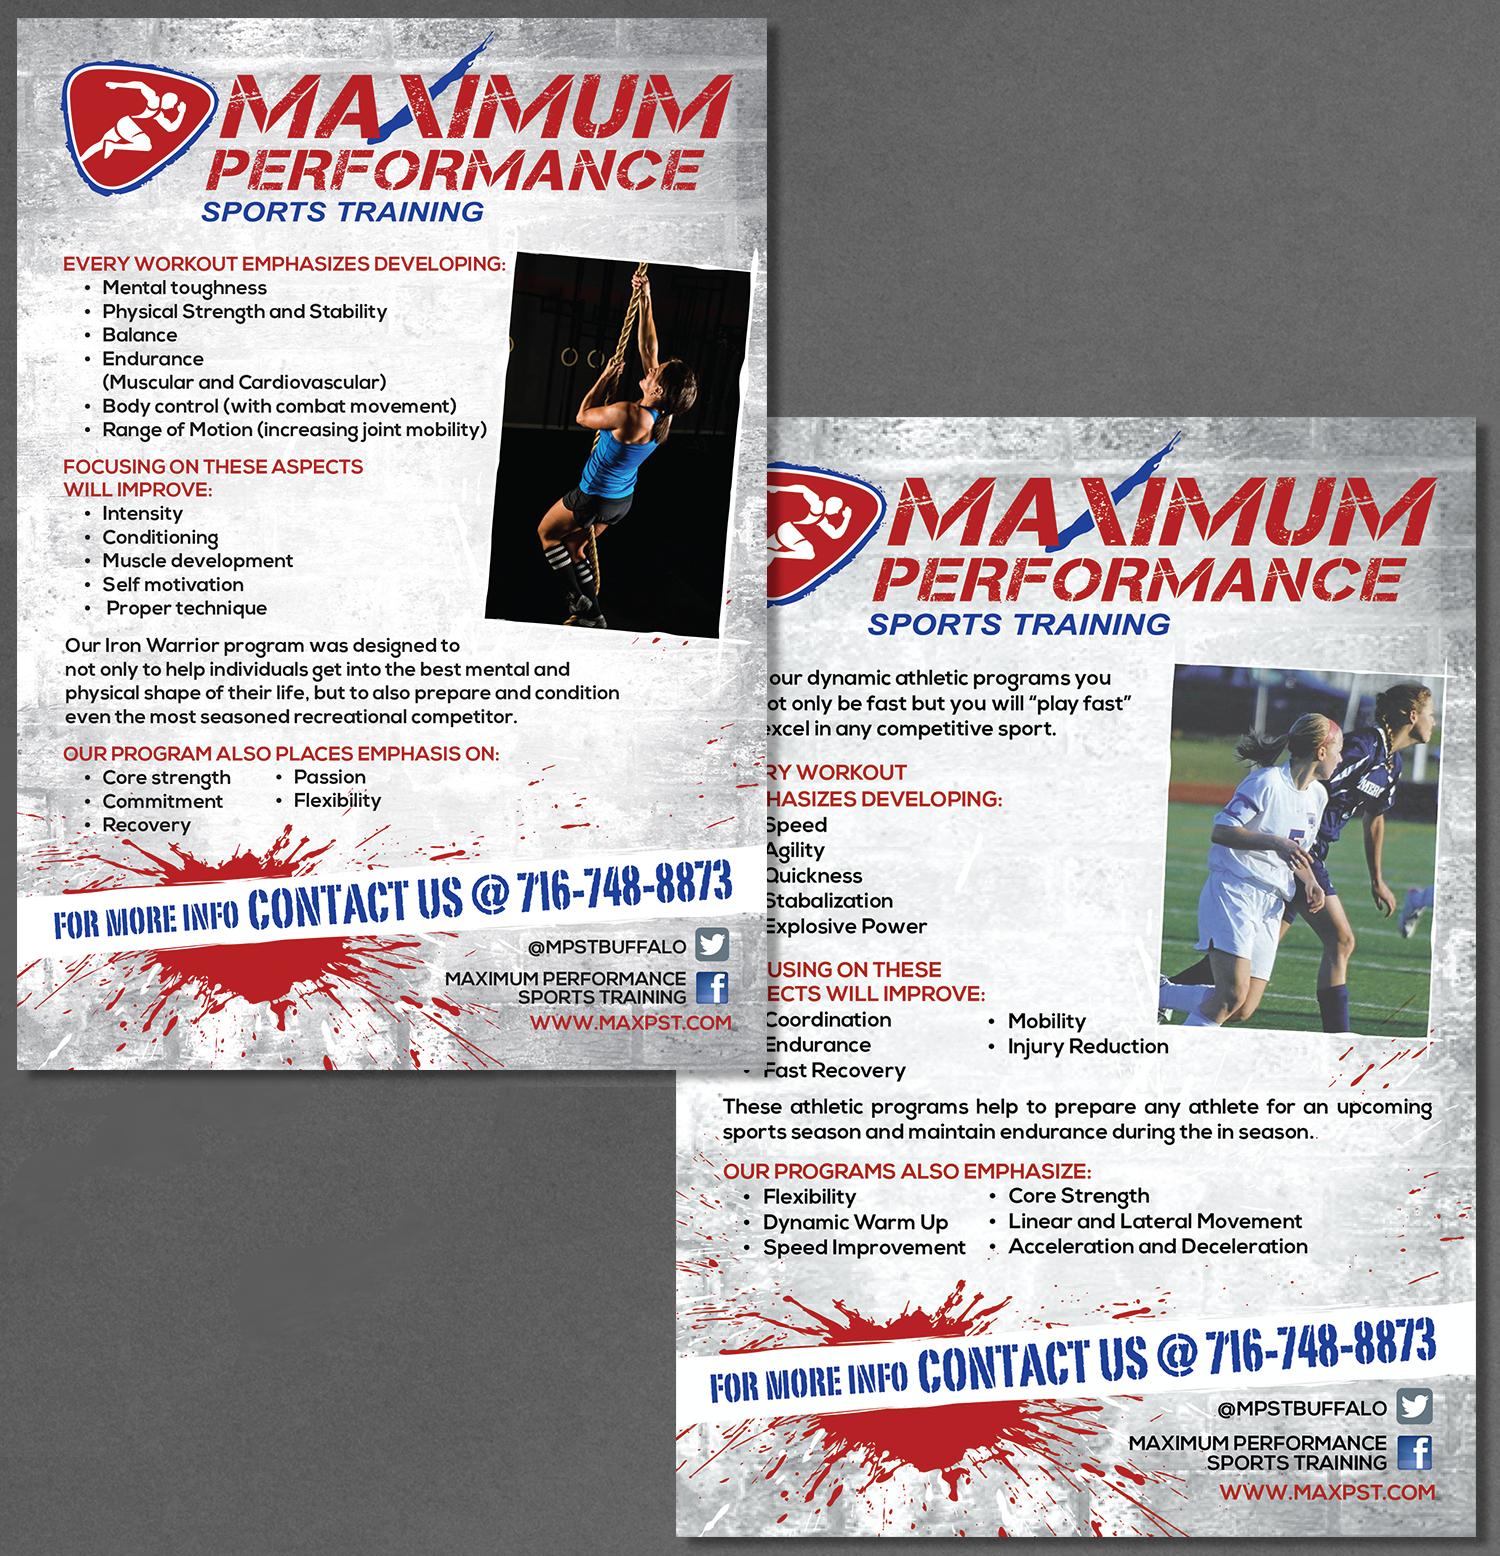 Maximum Performance Gym